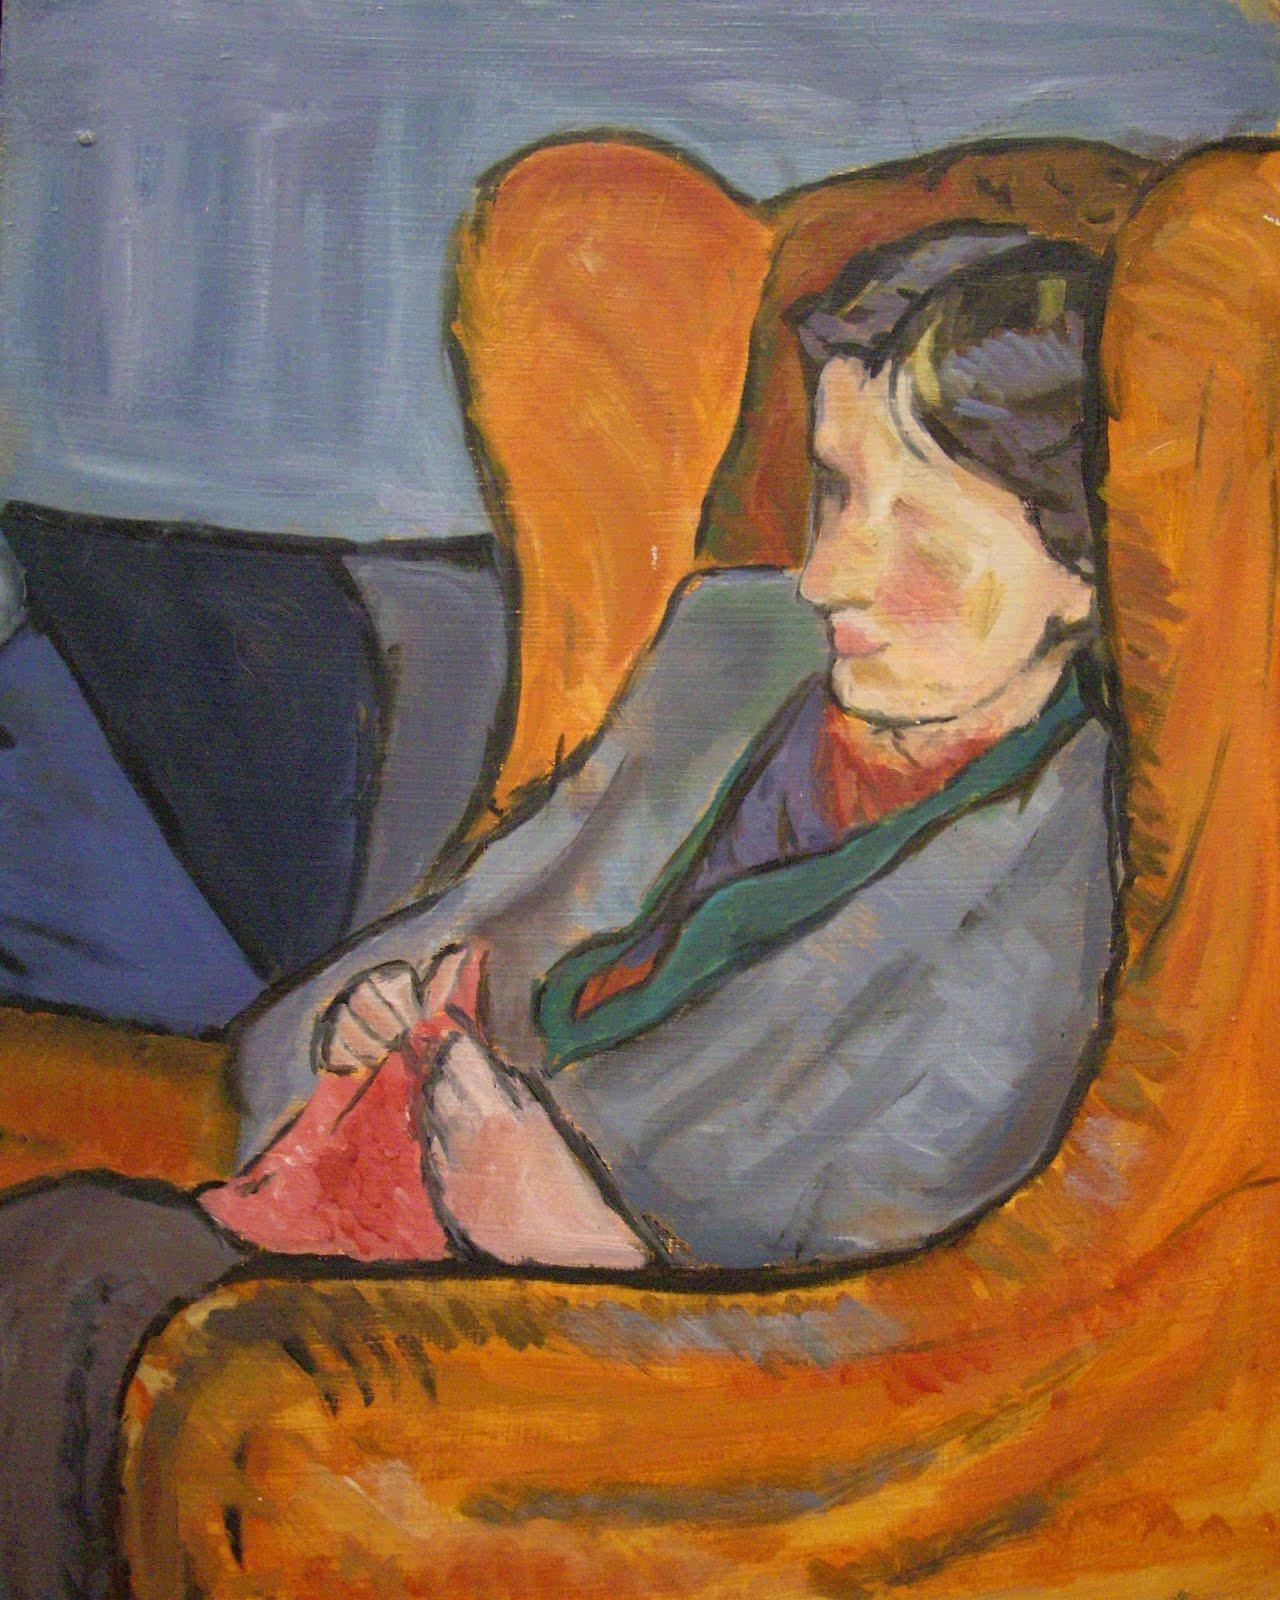 Modernist Women Writers - Junior Tutorial, Fall 2016